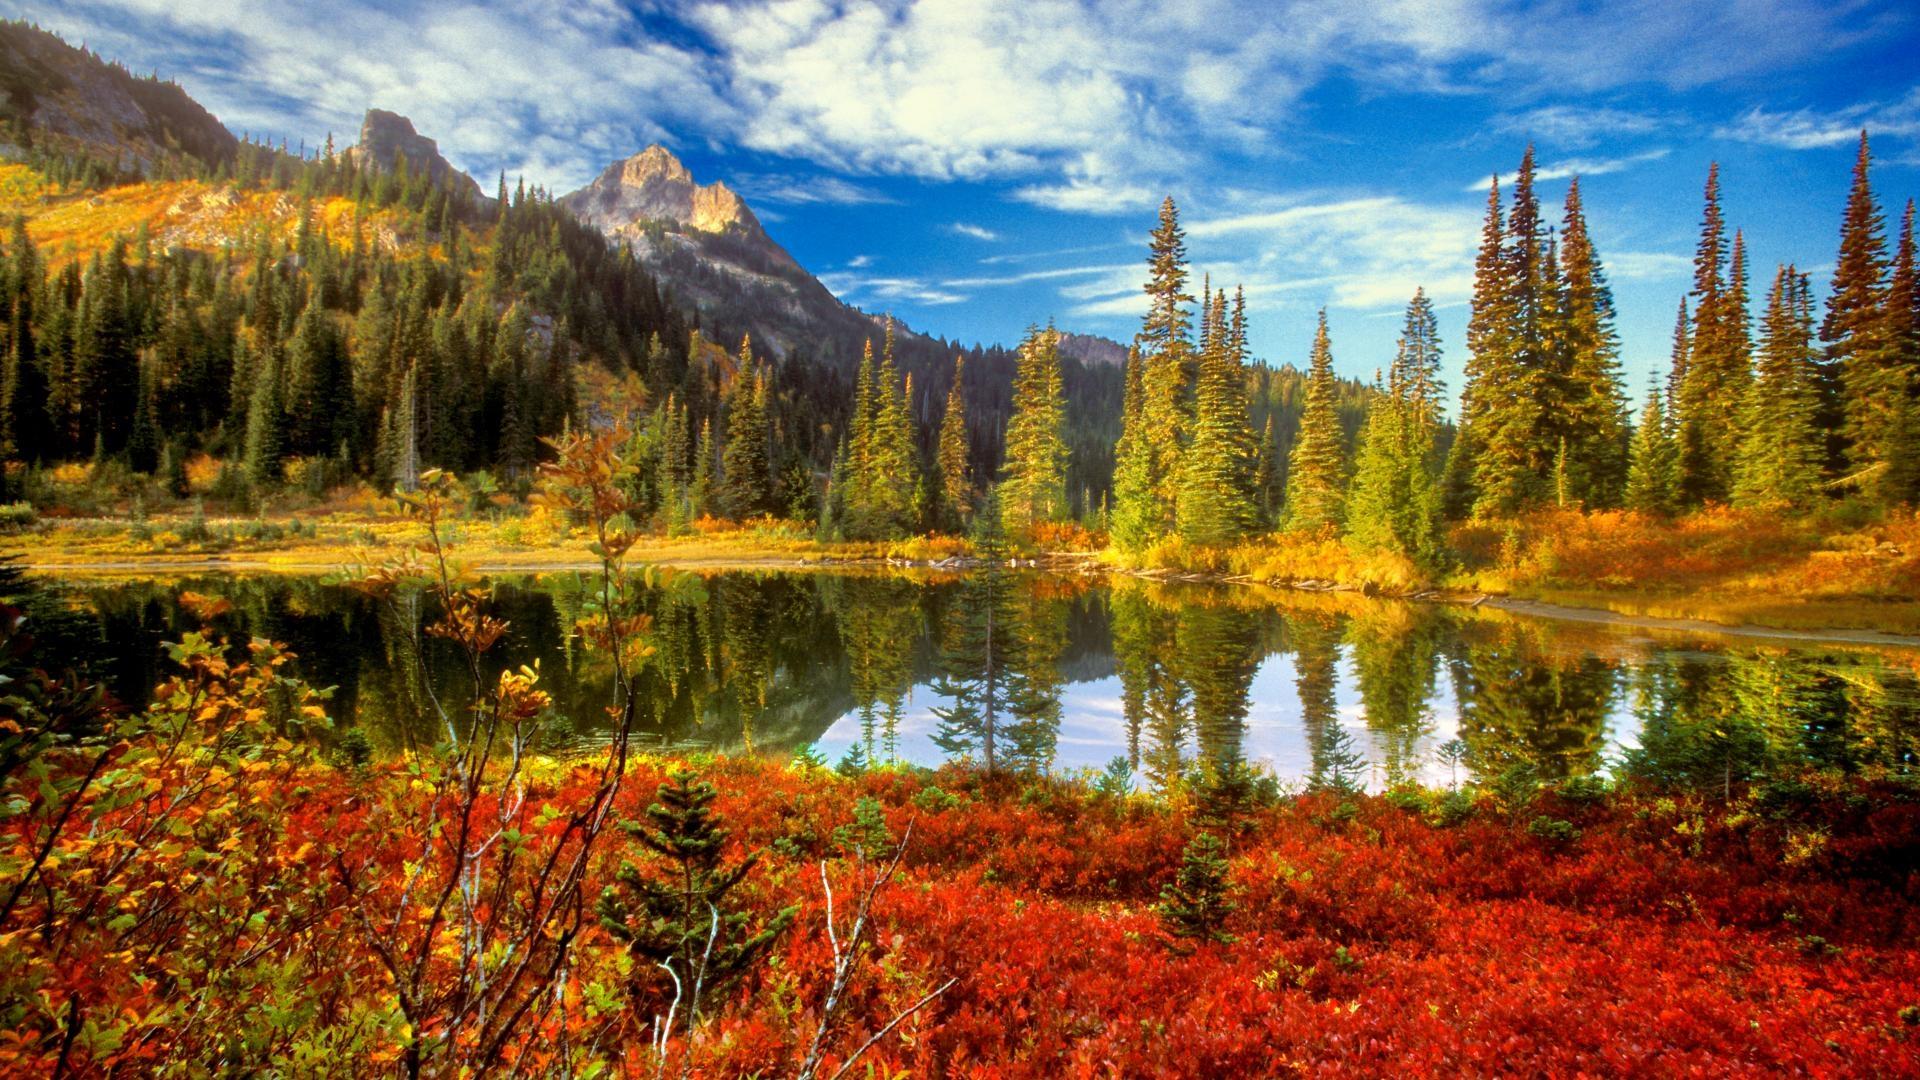 Beautiful Fall Backgrounds 35856 Hd Wallpapers Background   HDesktops 1920x1080